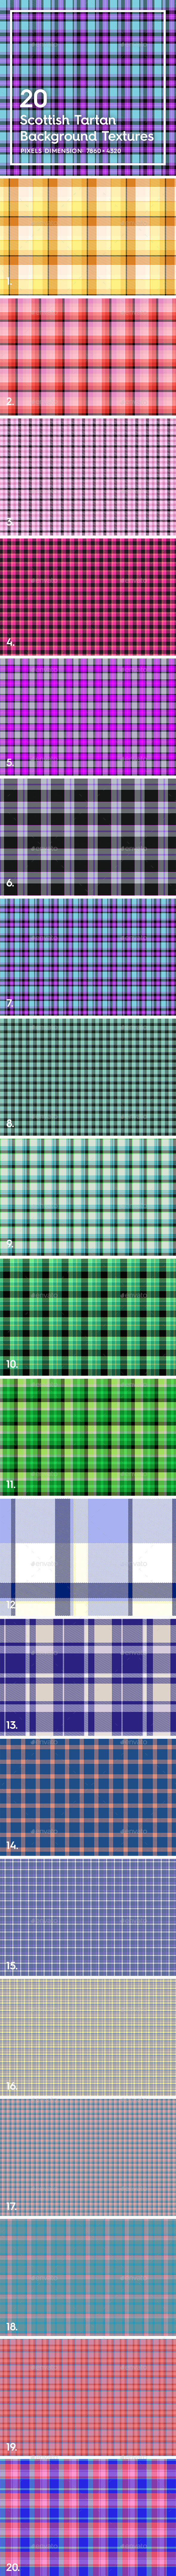 20 Scottish Tartan Backgrounds